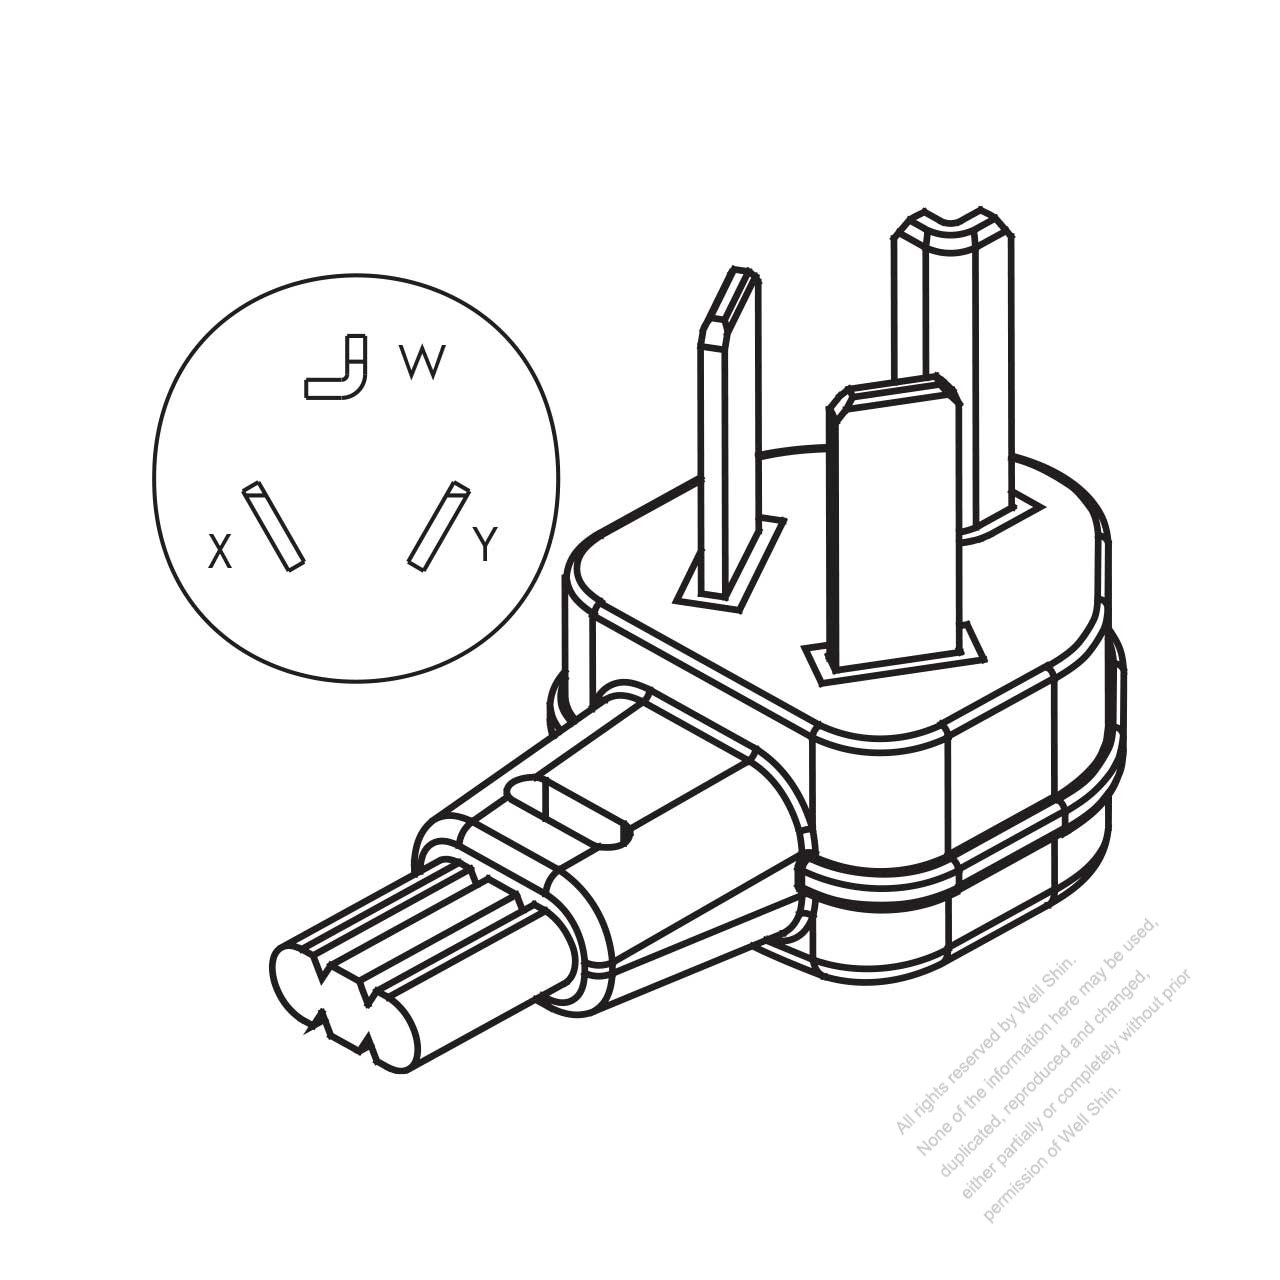 Nema 10 50R Wiring Diagram from www.wellshin.com.tw